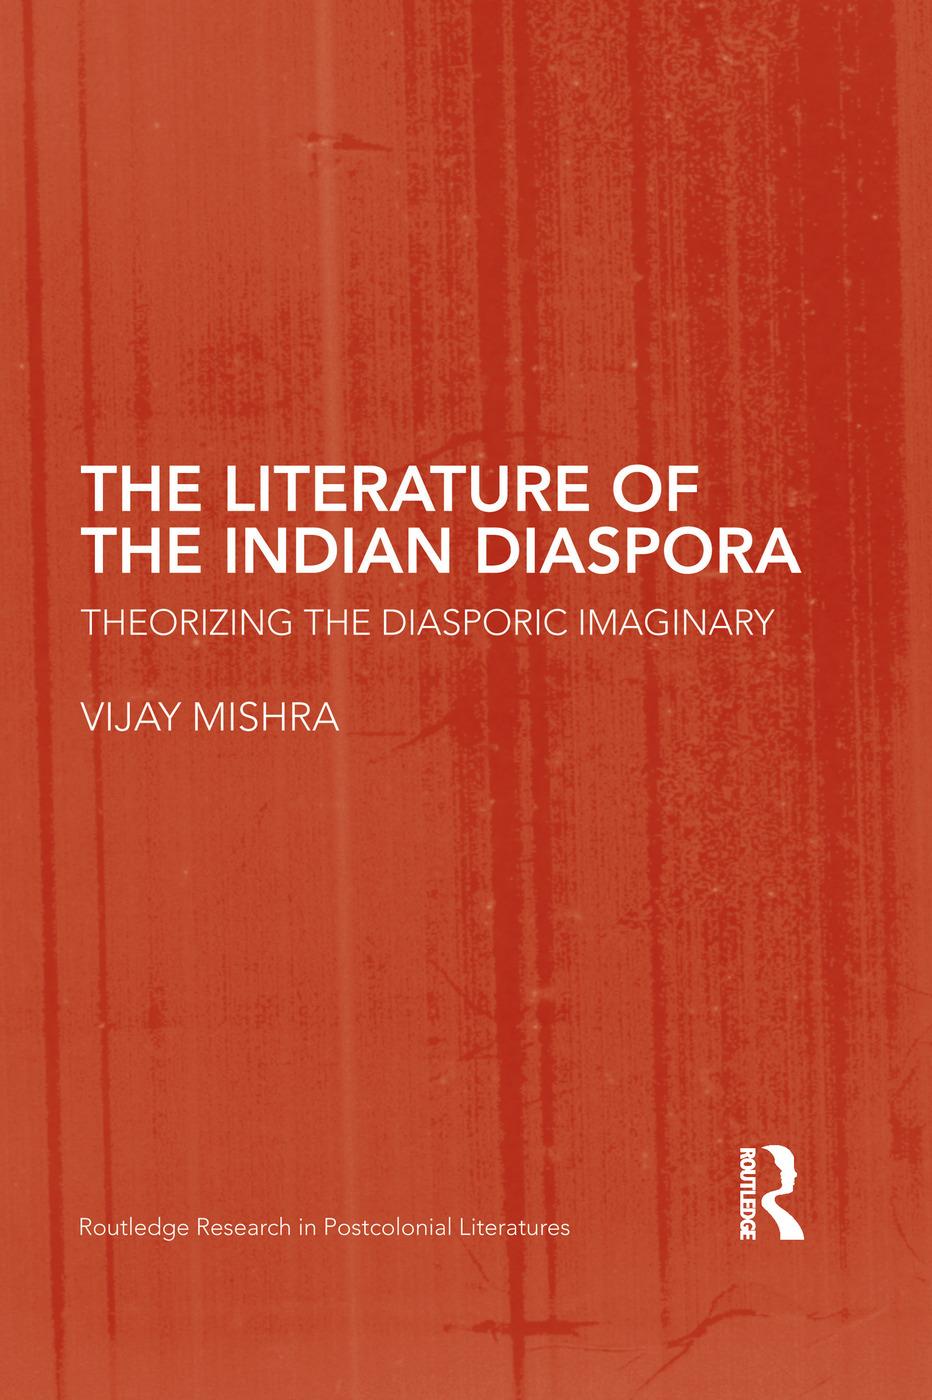 The Literature of the Indian Diaspora: Theorizing the Diasporic Imaginary book cover